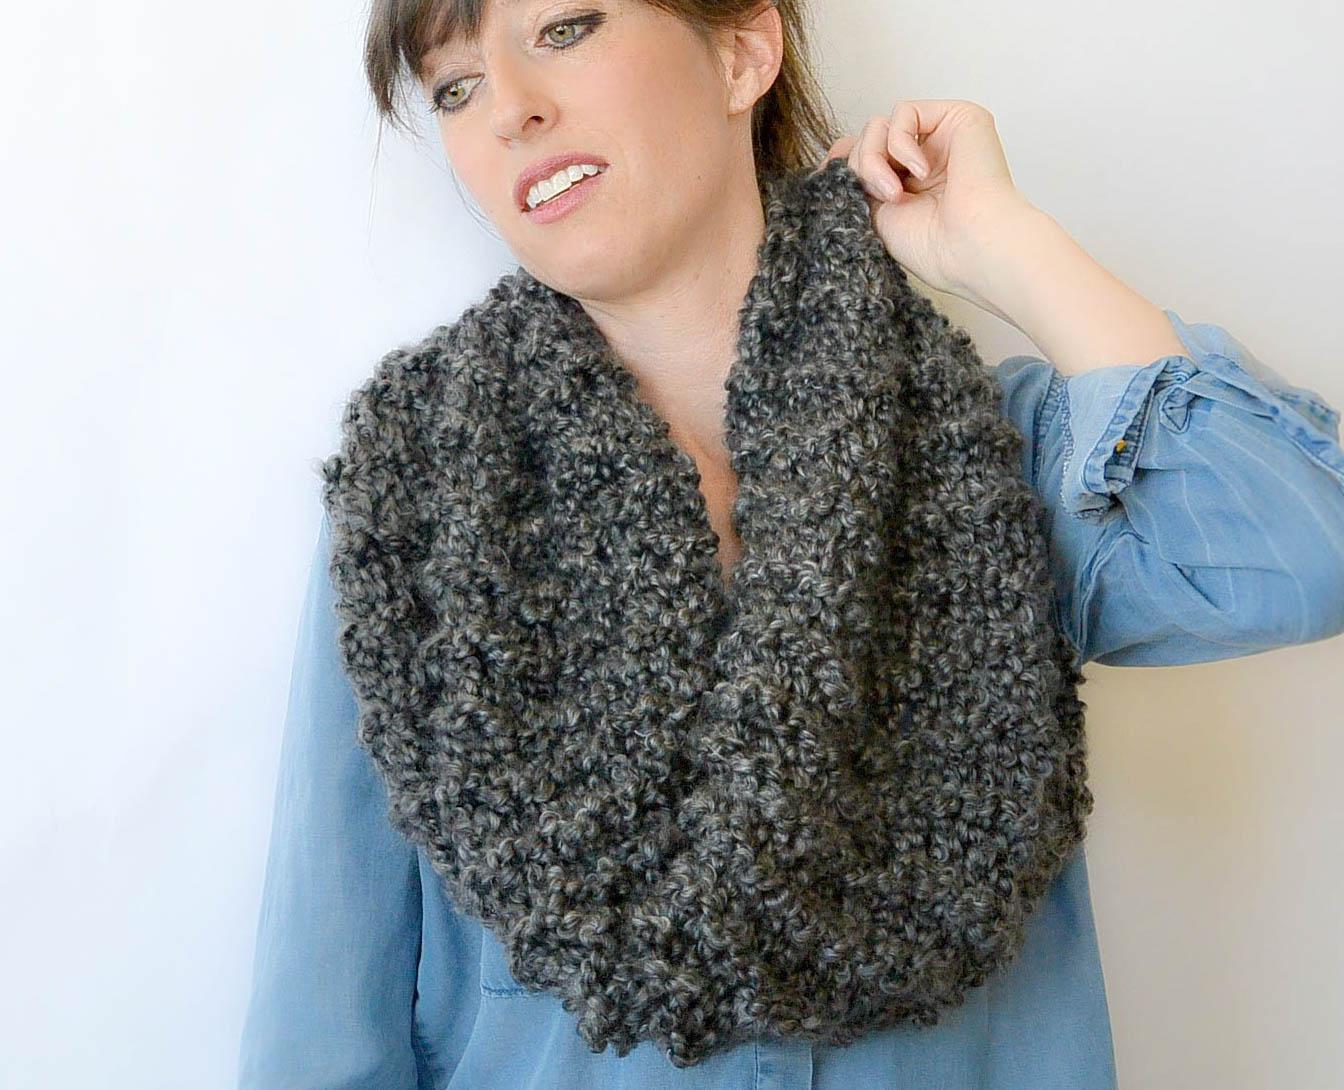 Beginner Crochet Patterns Cowl : TALL Eiffel Cowl ? Beginner Knitting Pattern